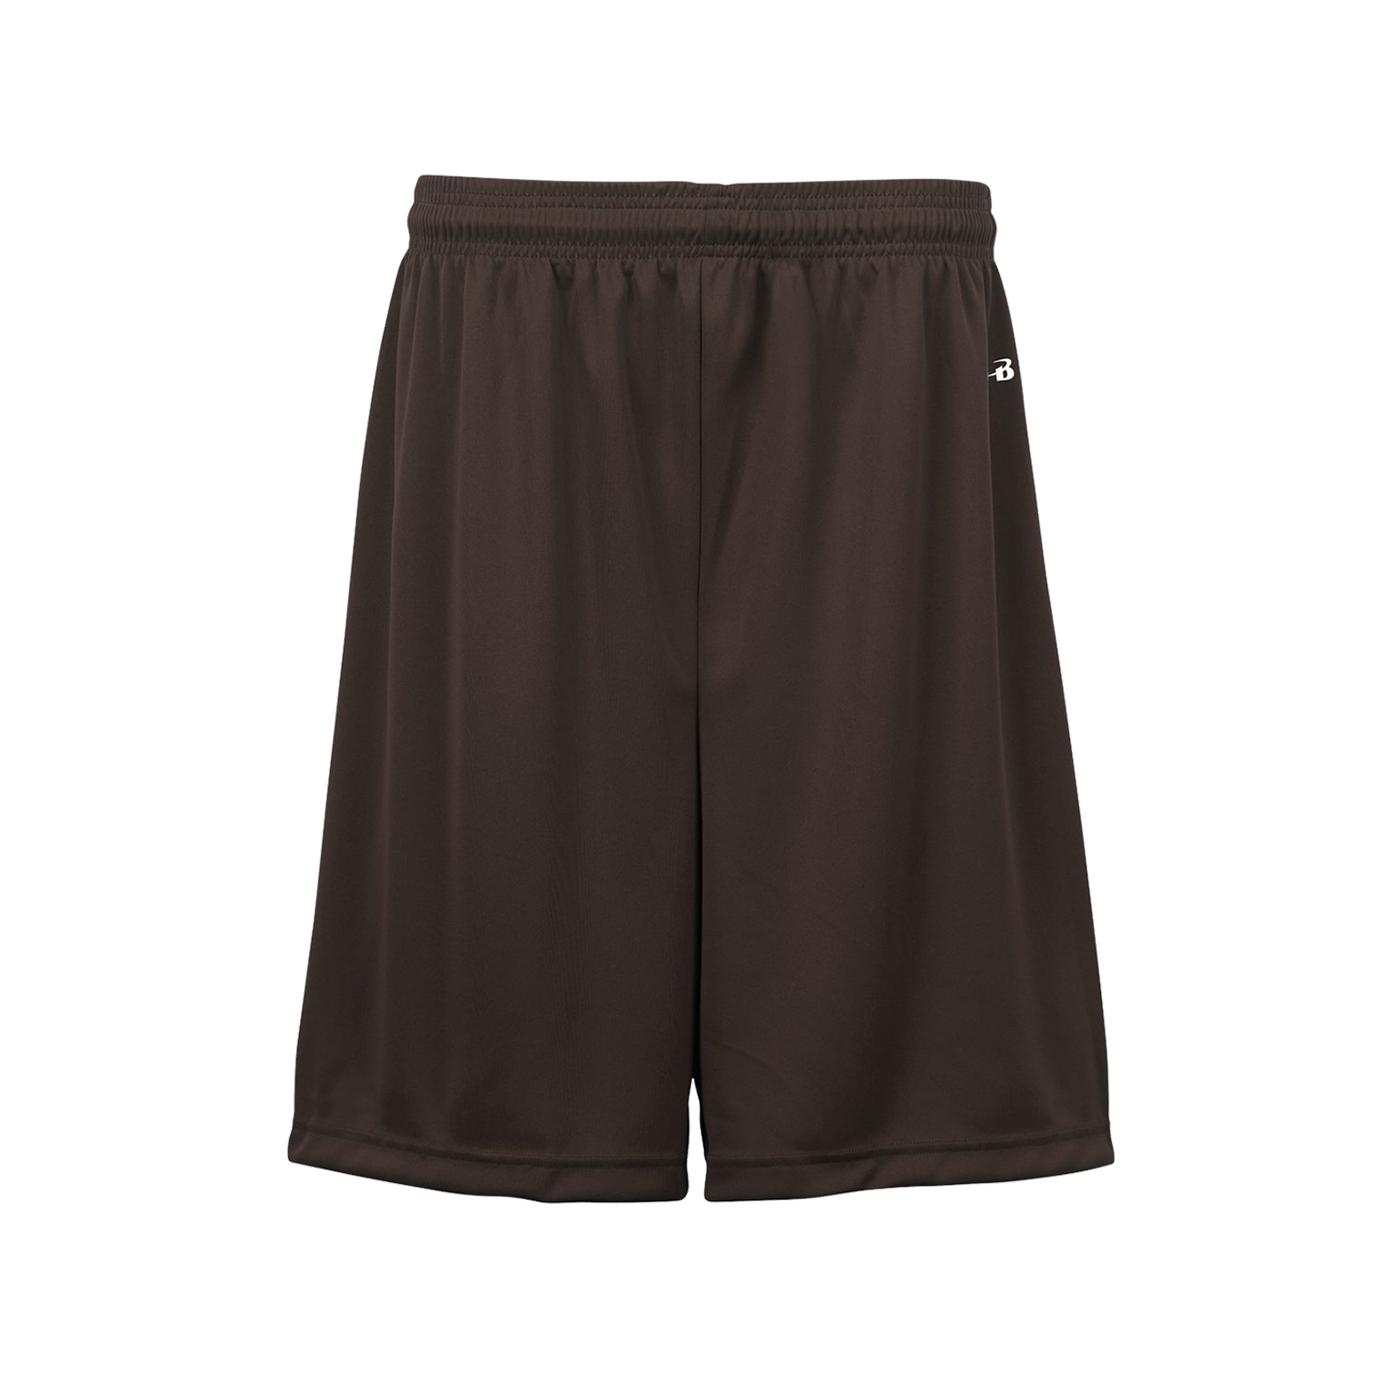 B-Core 7 Inch Short - Brown